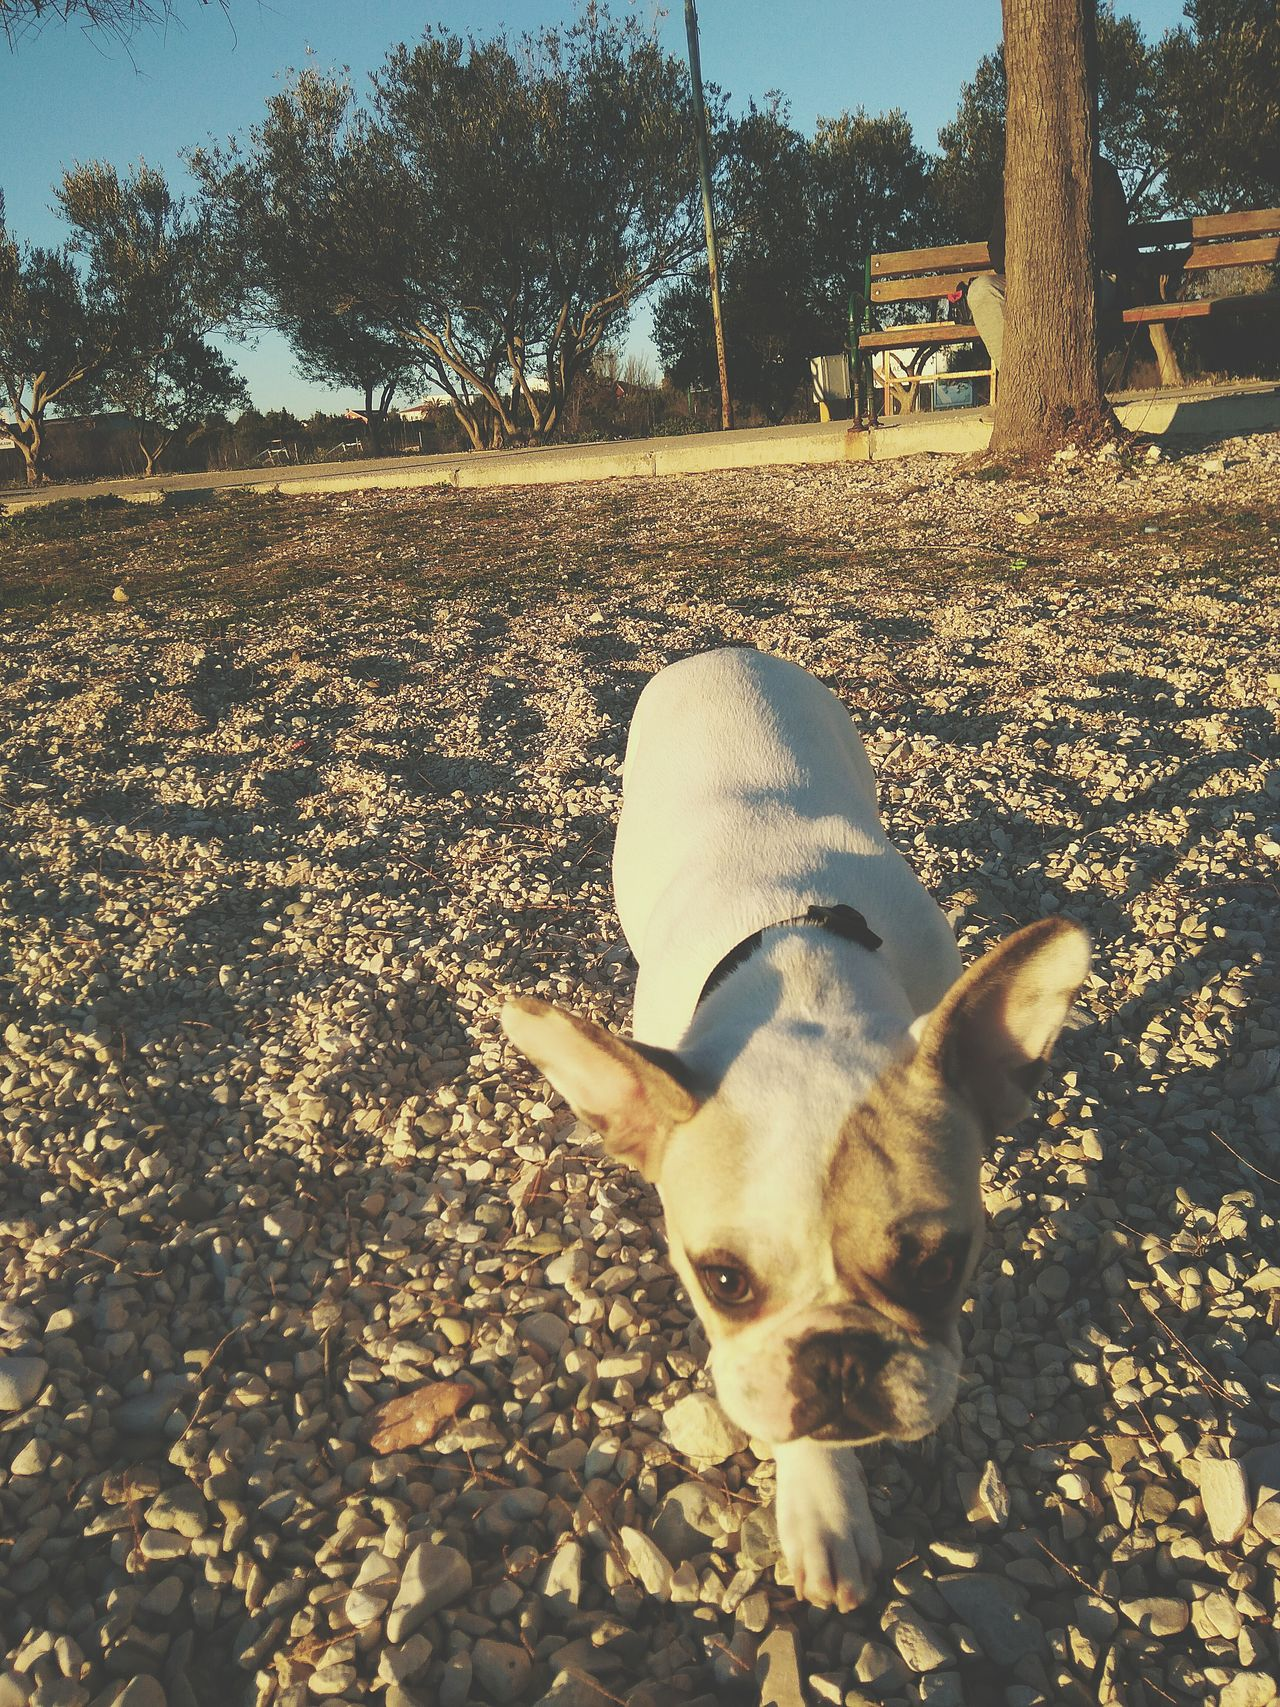 Dog Domestic Animals Pets Animal Themes Mammal One Animal Outdoors Frenchbulldog Frenchie